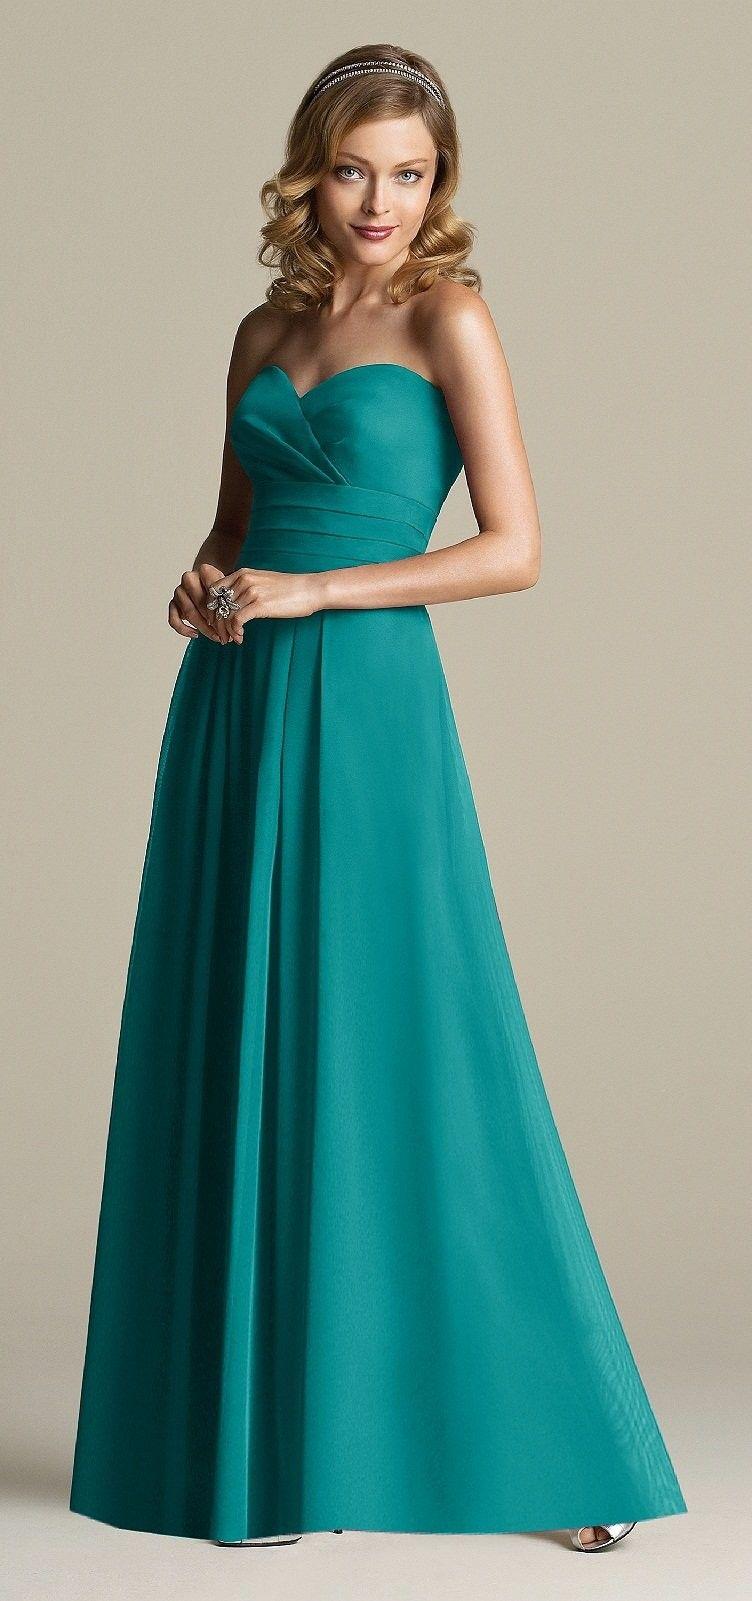 609 - Windsor Blue | The Wedding Party | Pinterest | Windsor FC ...